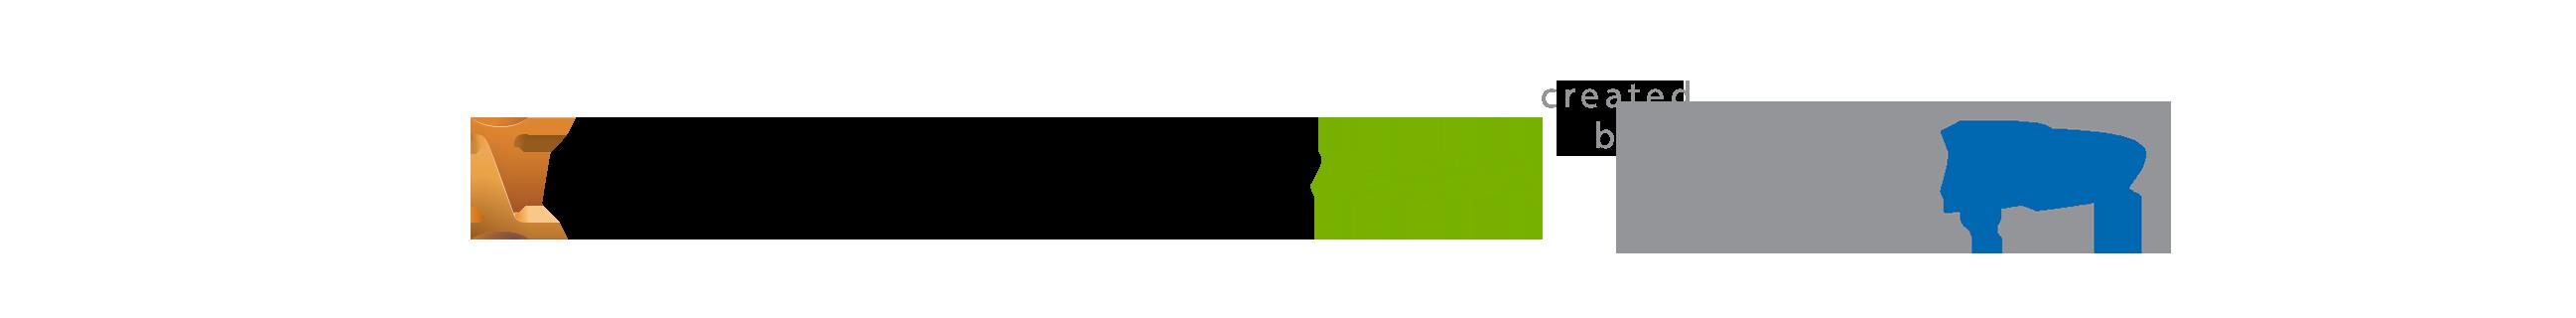 Blog-Inventor-byTeamD3-3